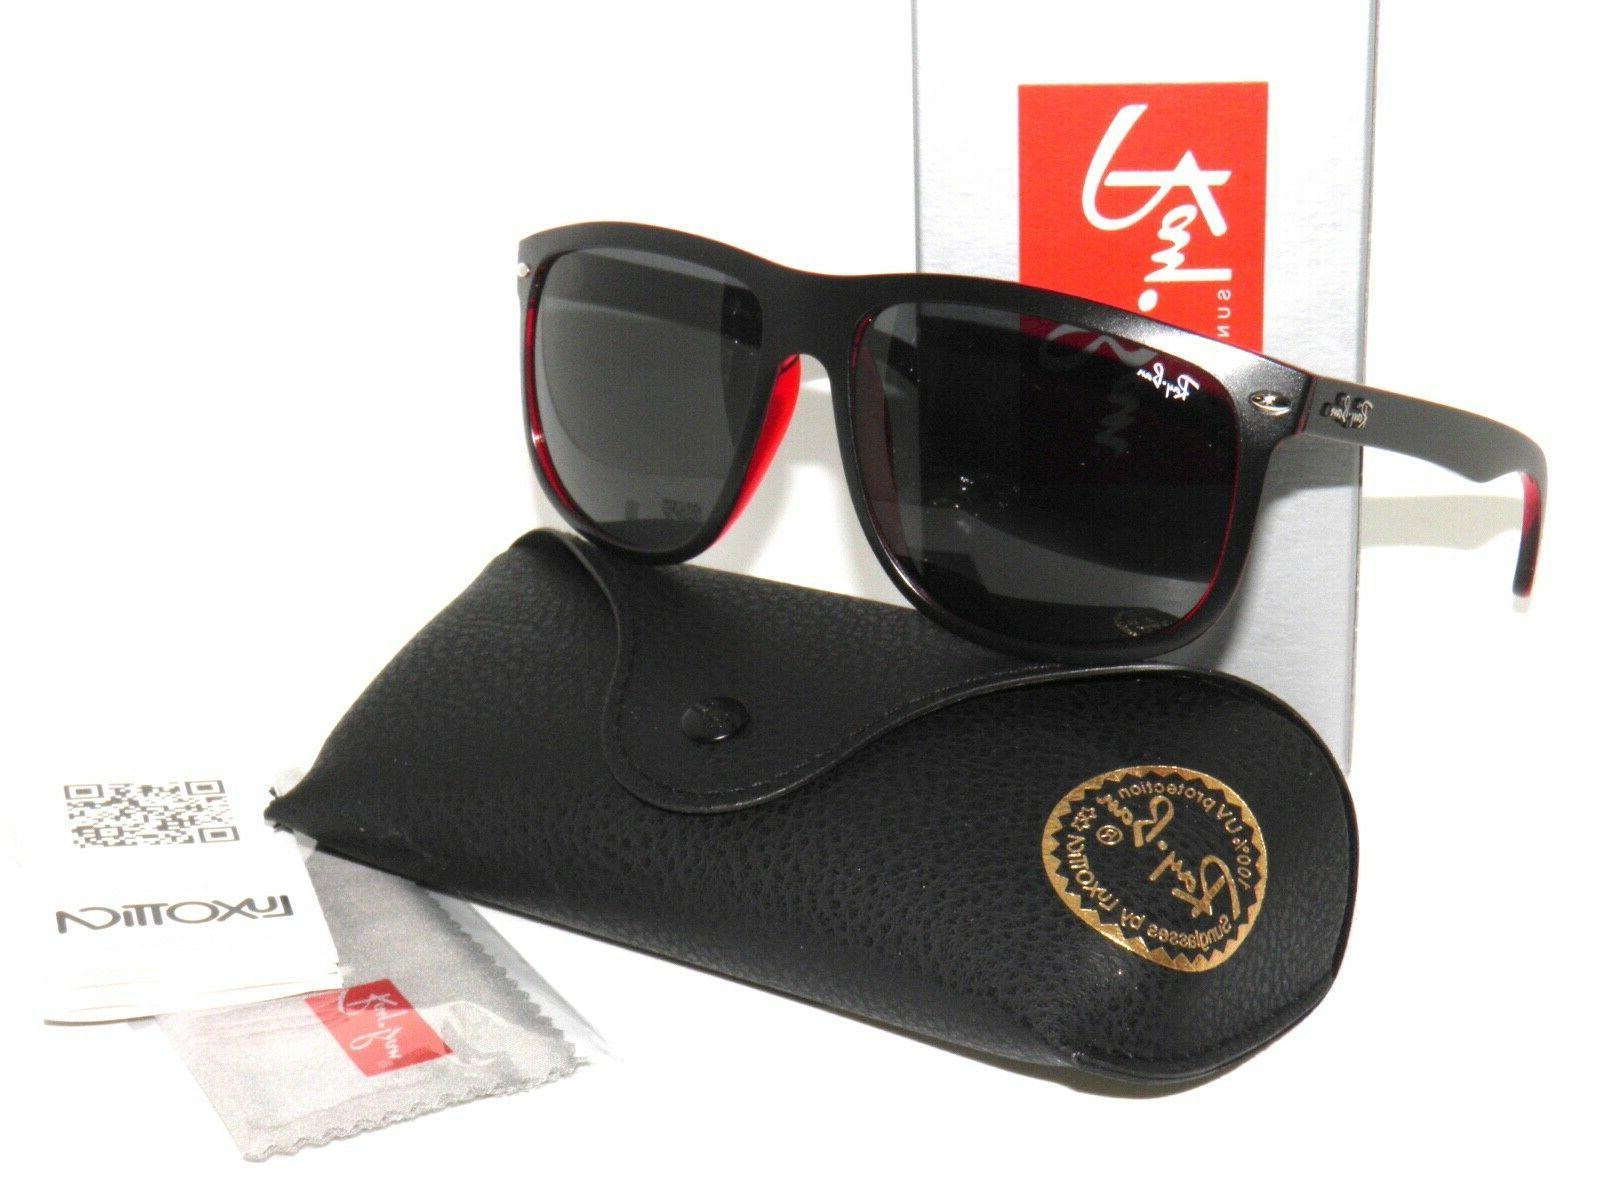 boyfriend sunglasses 4147 617187 60 black on